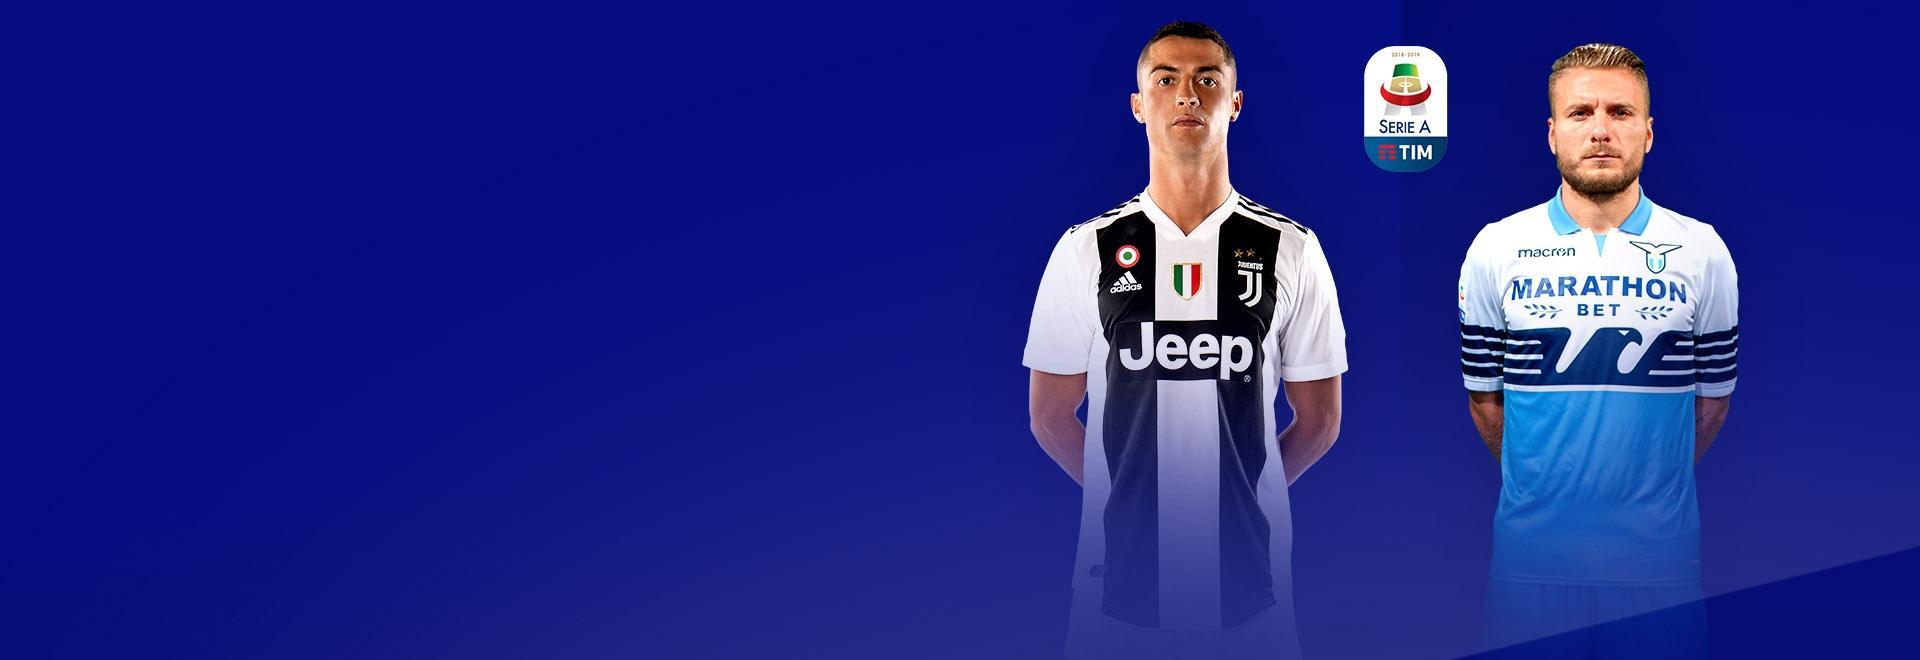 Juventus - Lazio. 2a g.